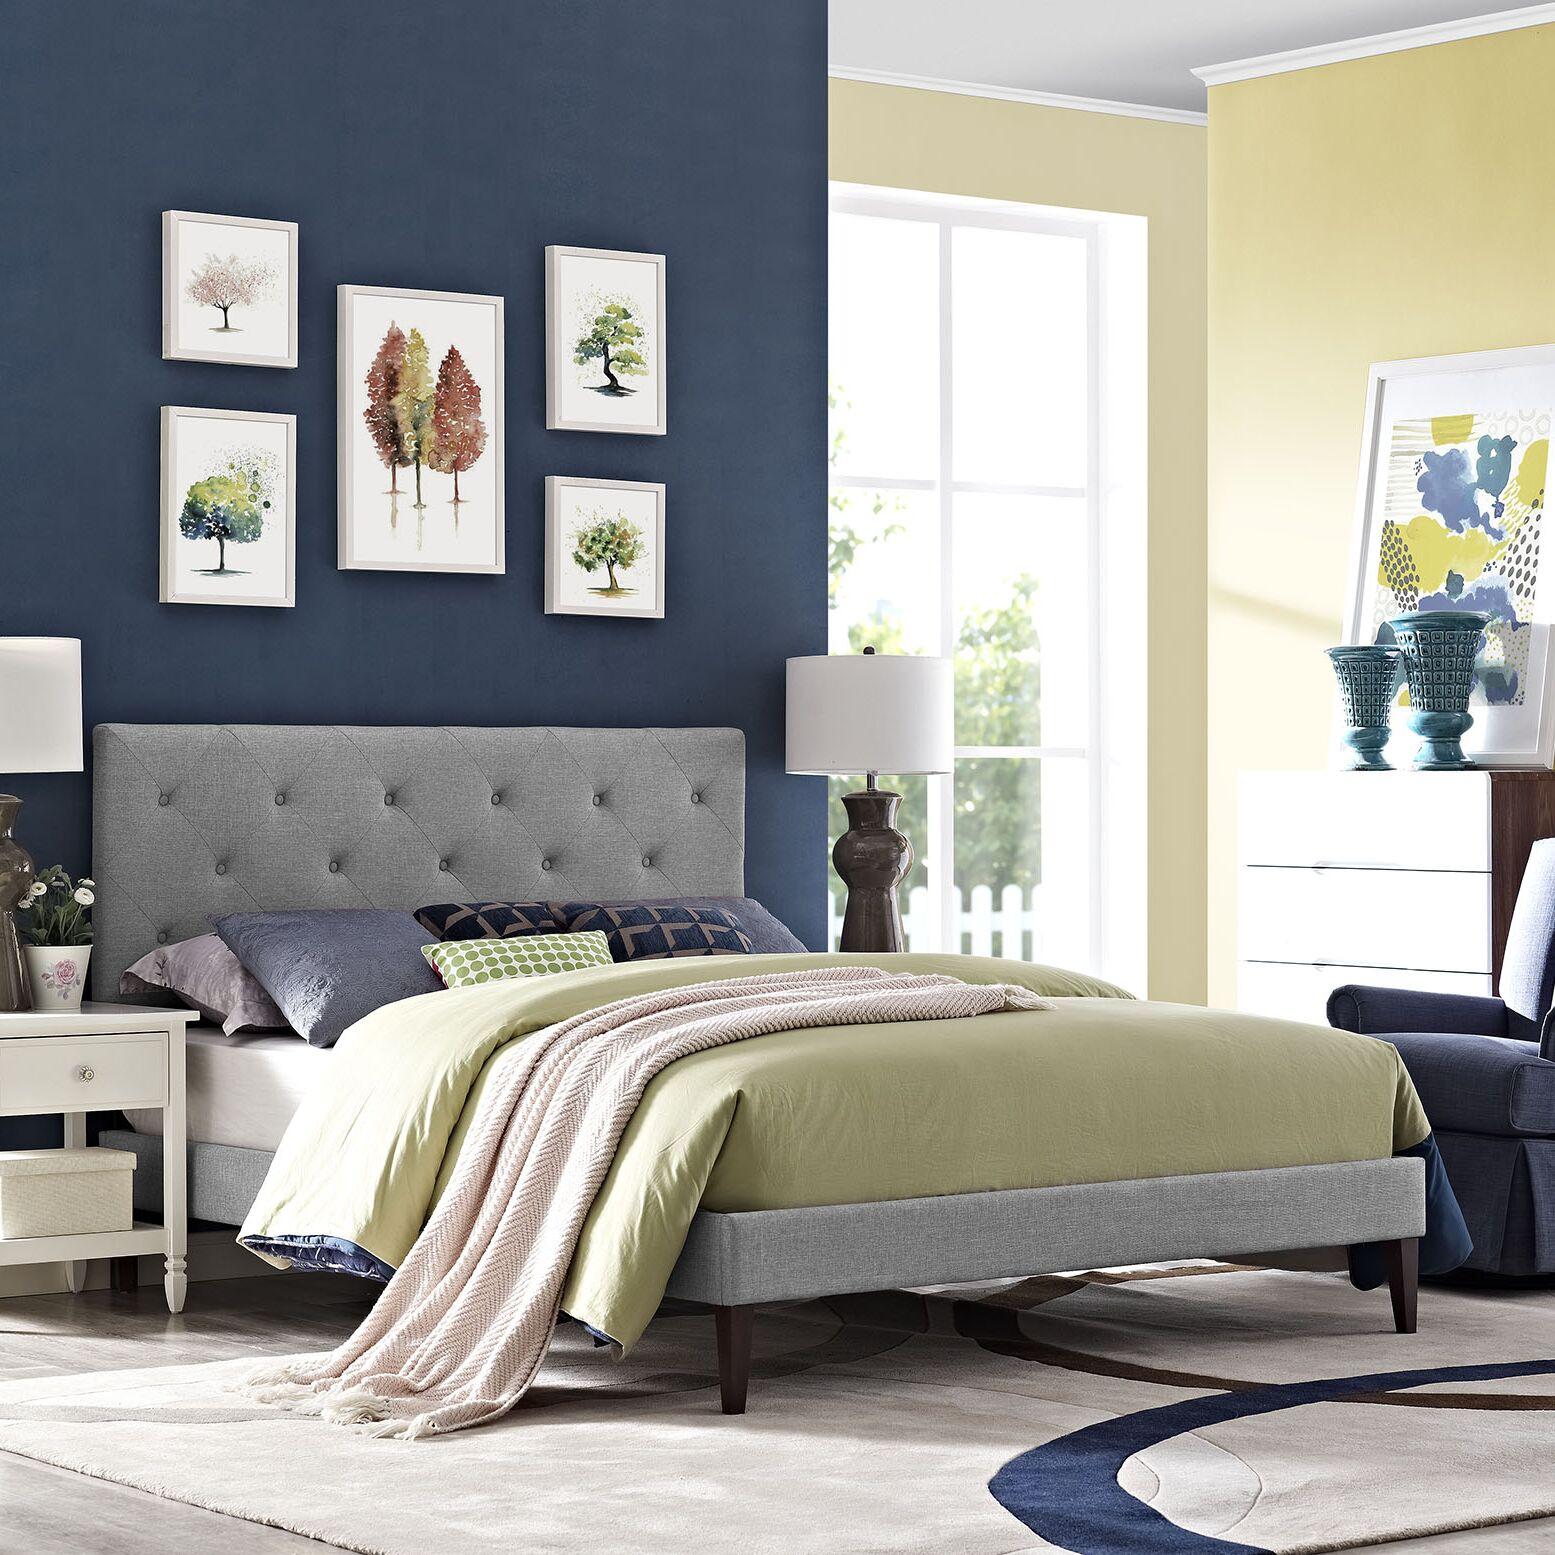 Ziemer Upholstered Platform Bed Size: Full, Color: Light Gray